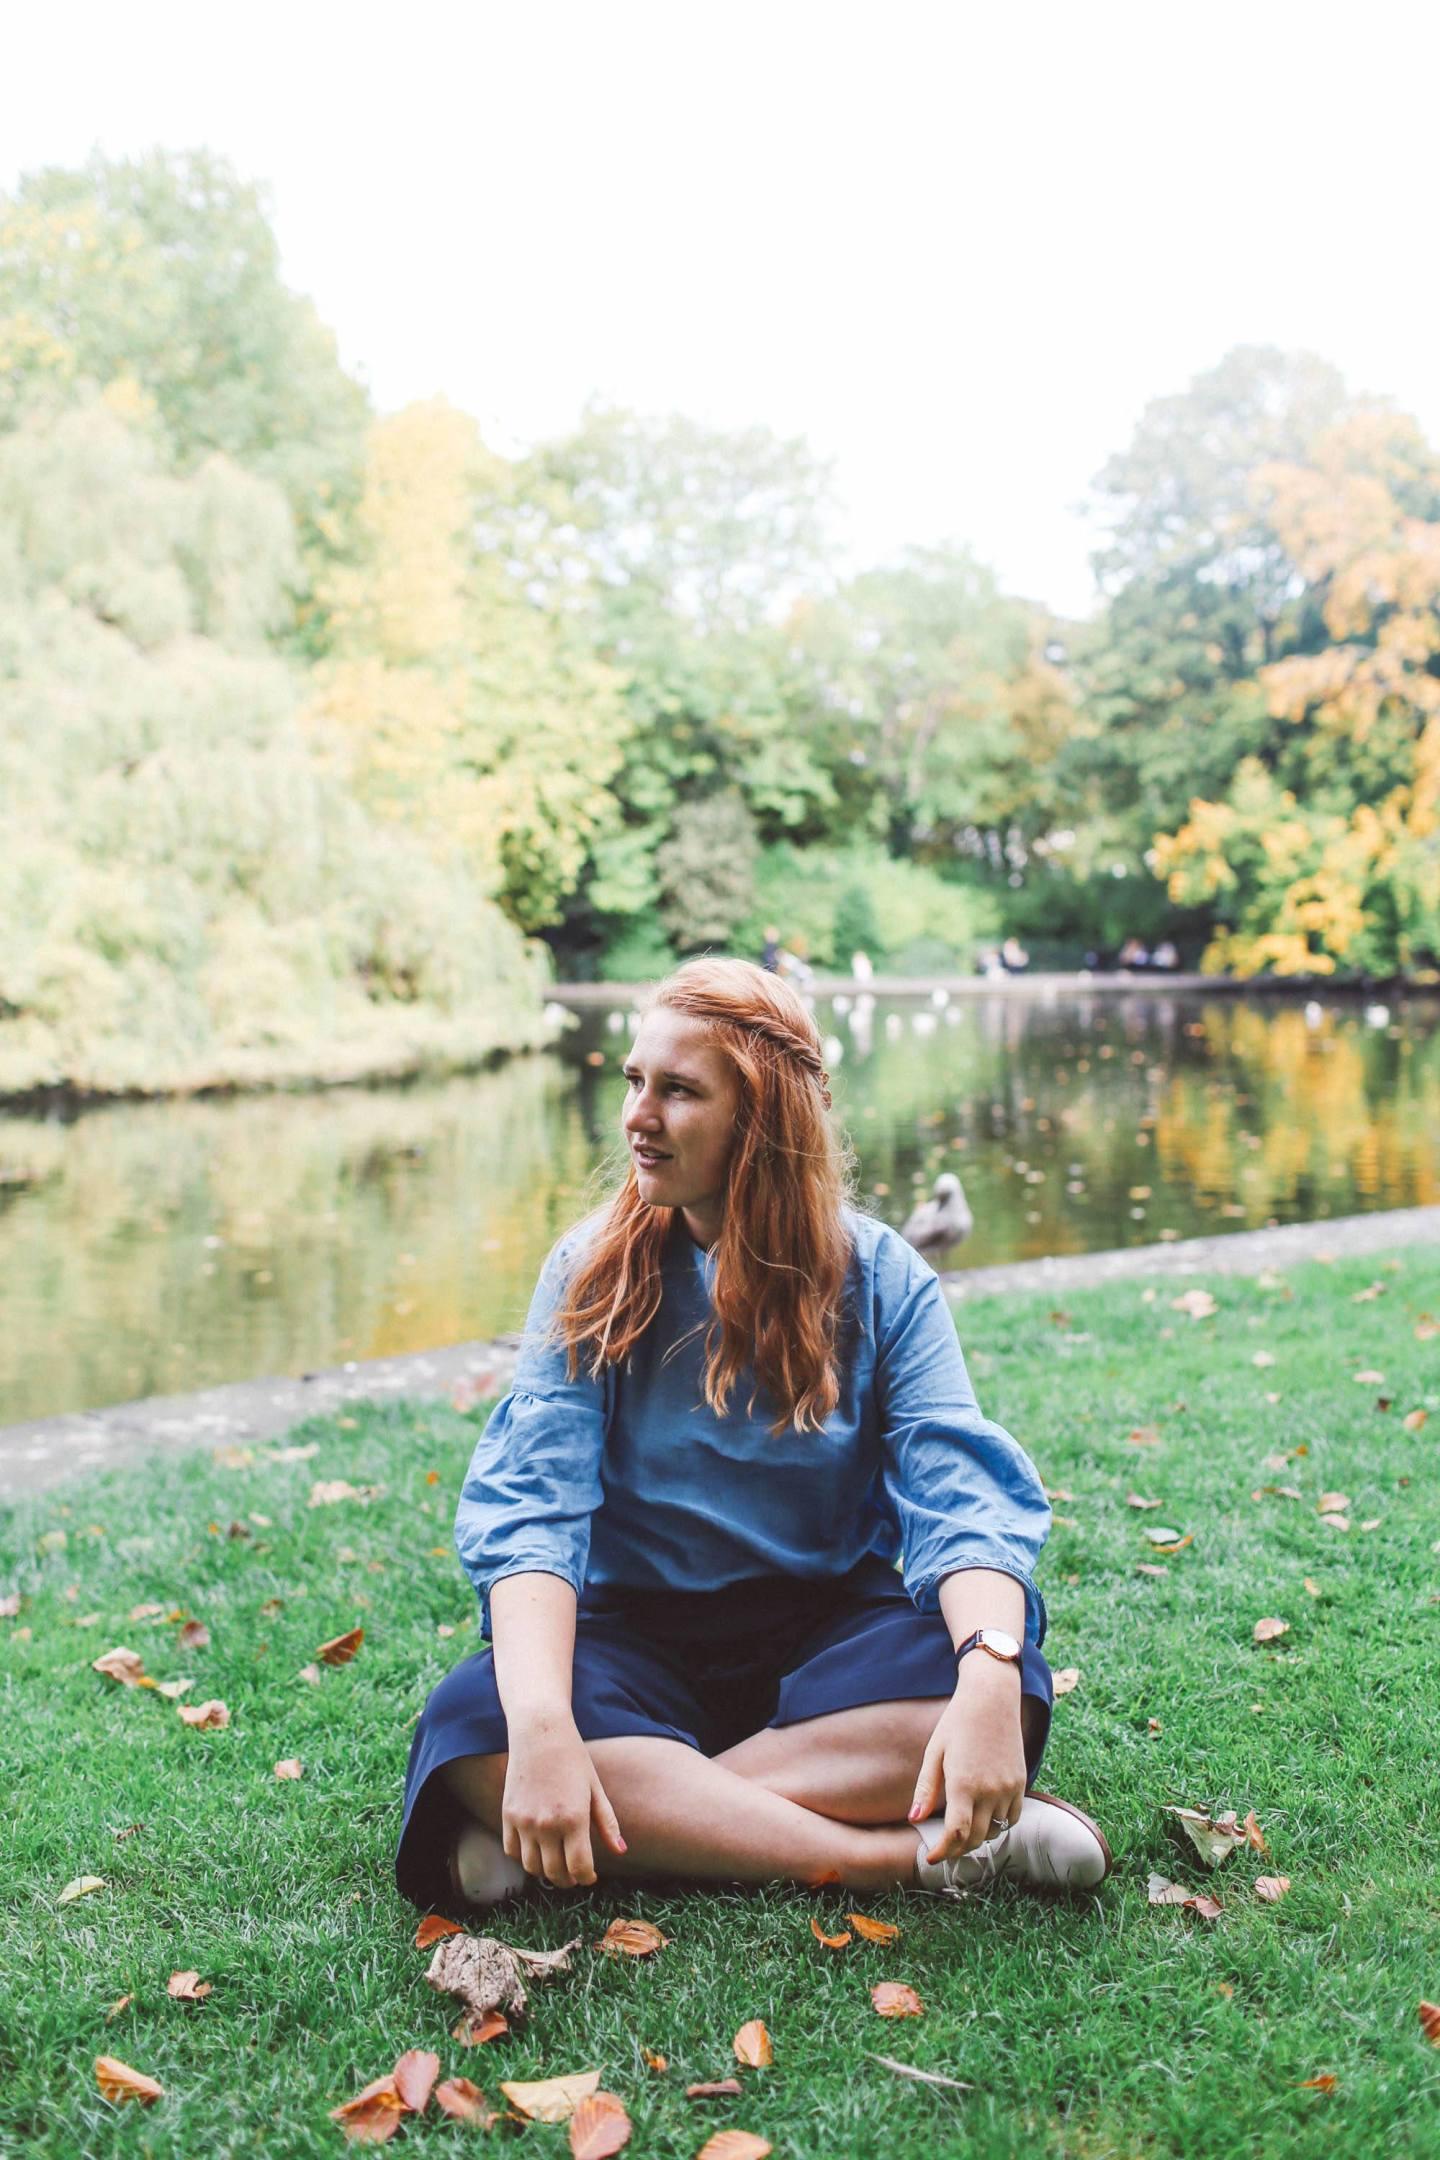 stephens green park ireland blue shirt woman